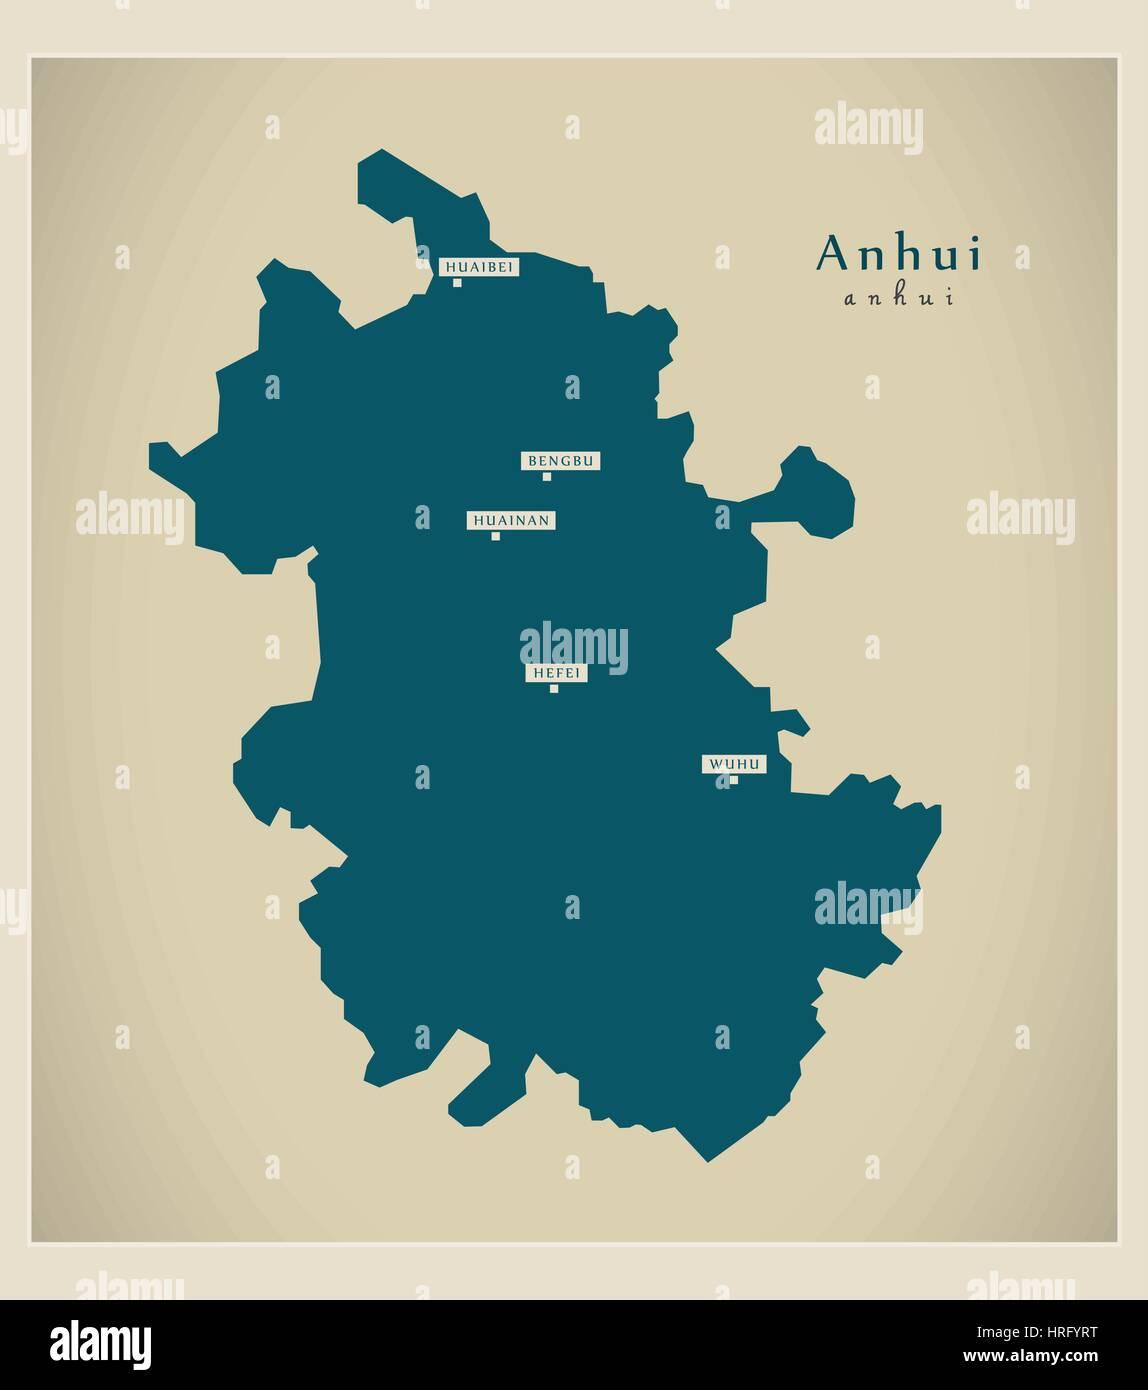 Modern Map - Anhui - Stock Image